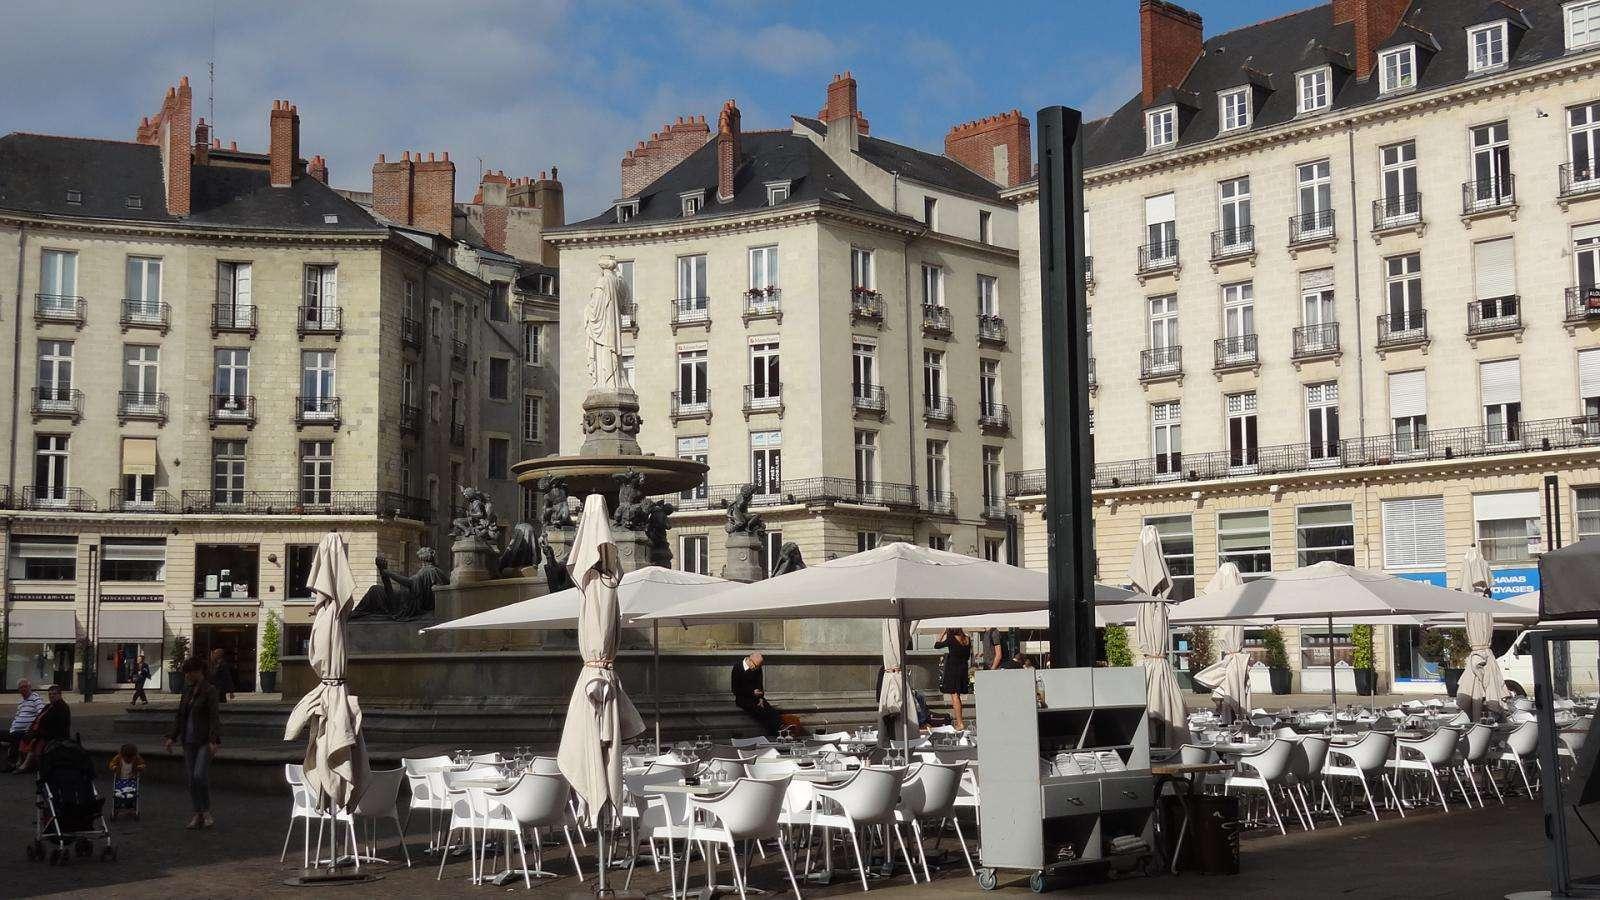 Longchamp : Maroquinerie Nantes 44000 (adresse, horaire et avis)